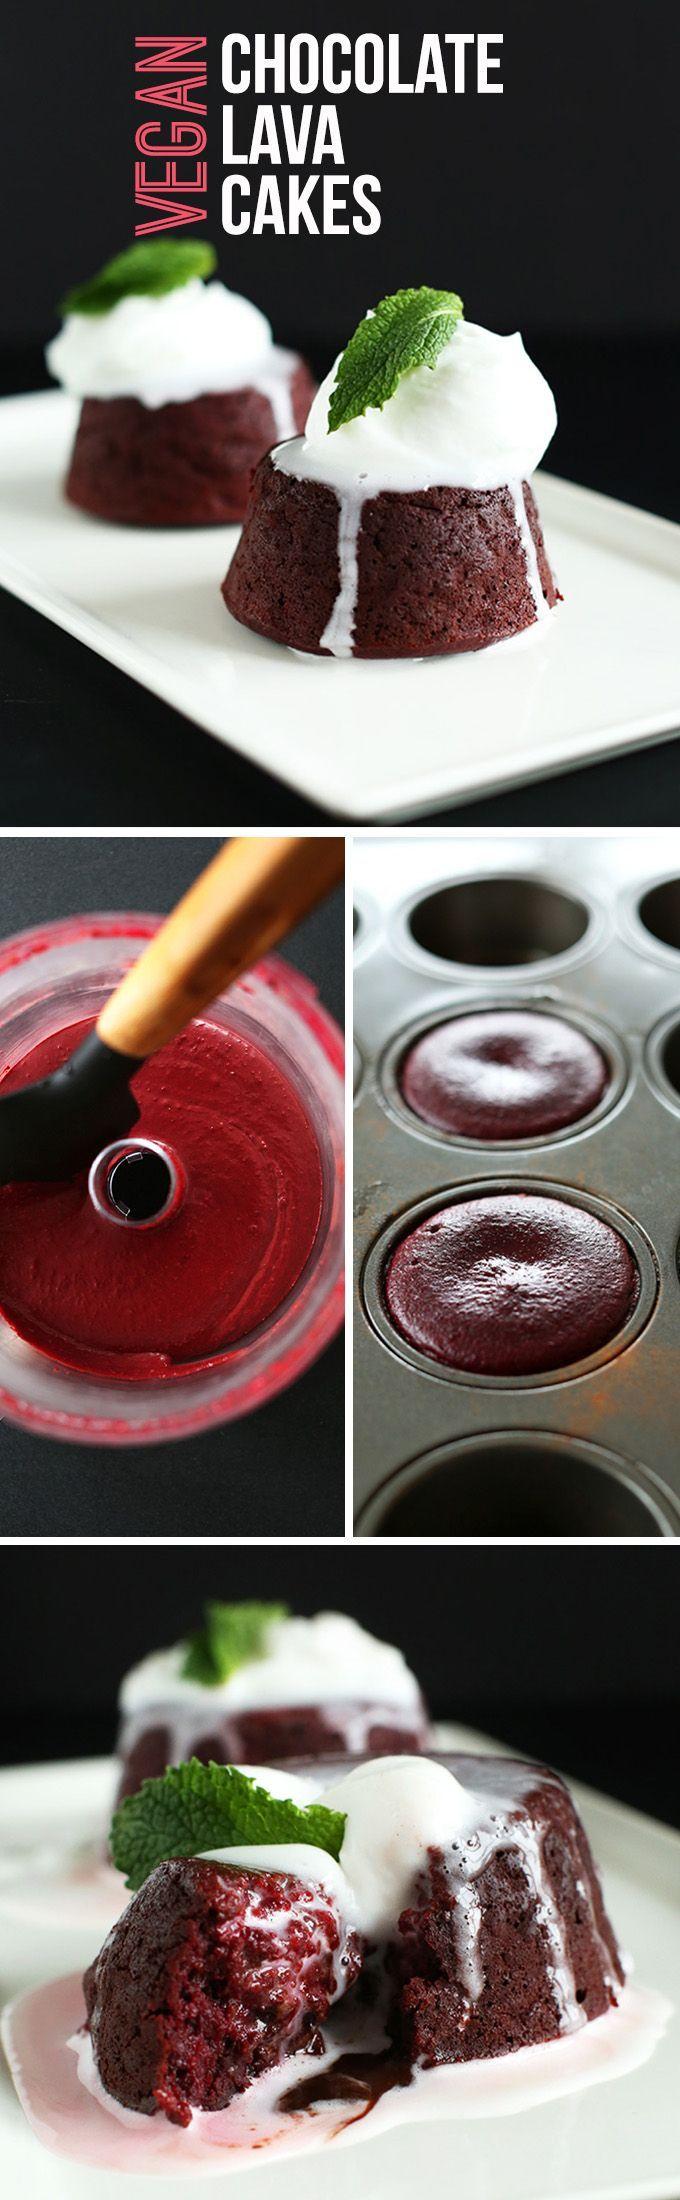 valentine's day molten chocolate cake recipe